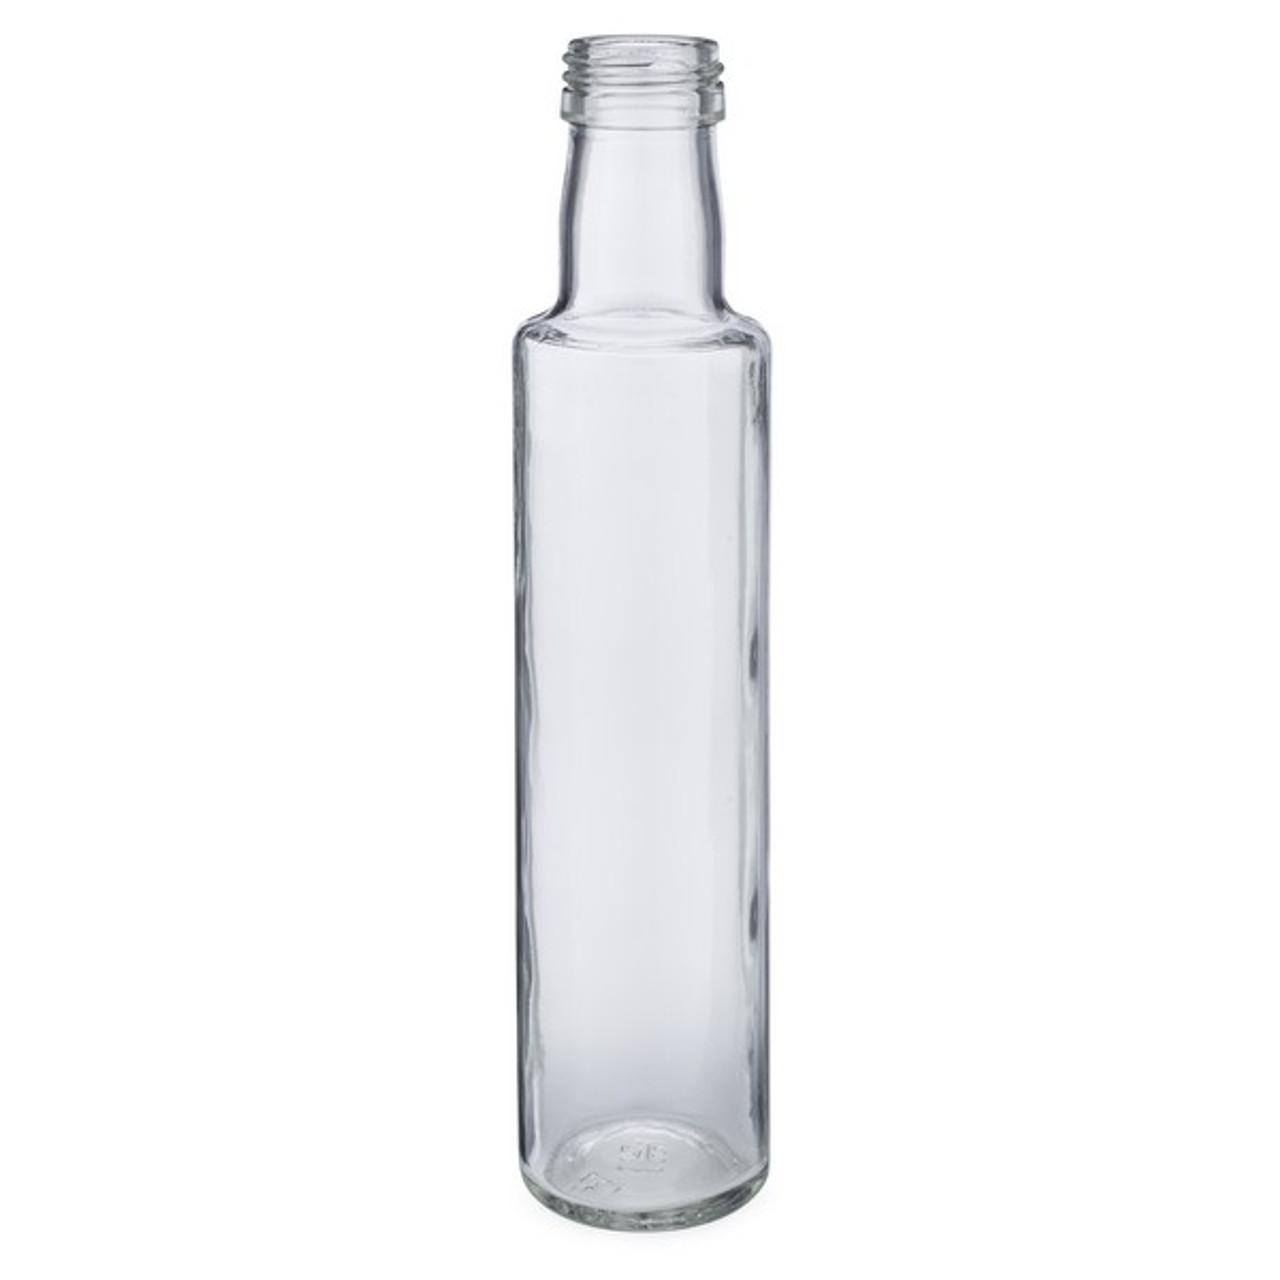 Glass Dorica Oil Bottle| Wholesale & Bulk | Berlin Packaging